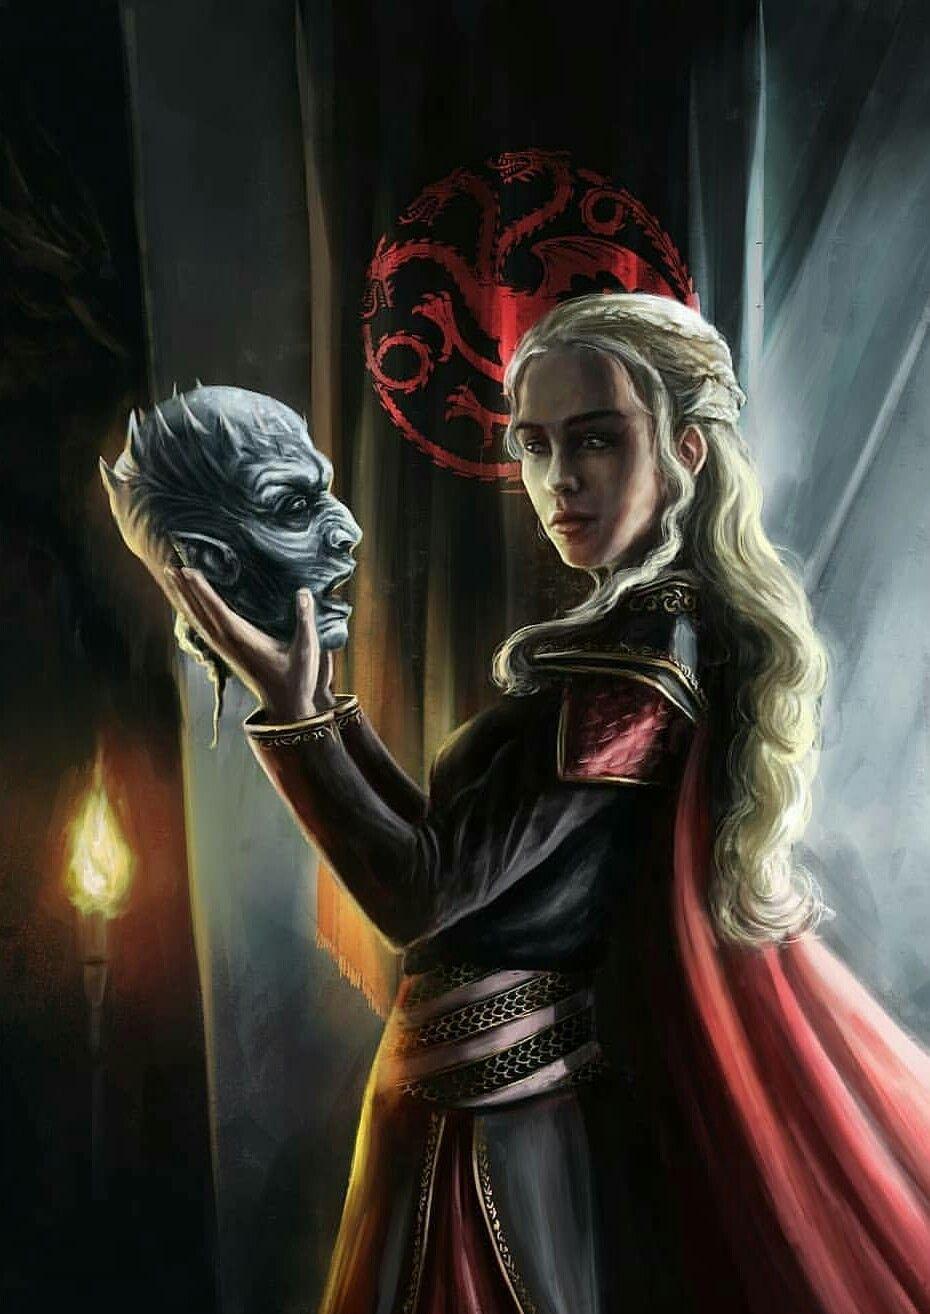 Theories Artwork By Siderfranklin On Instagram Game Of Thrones Art